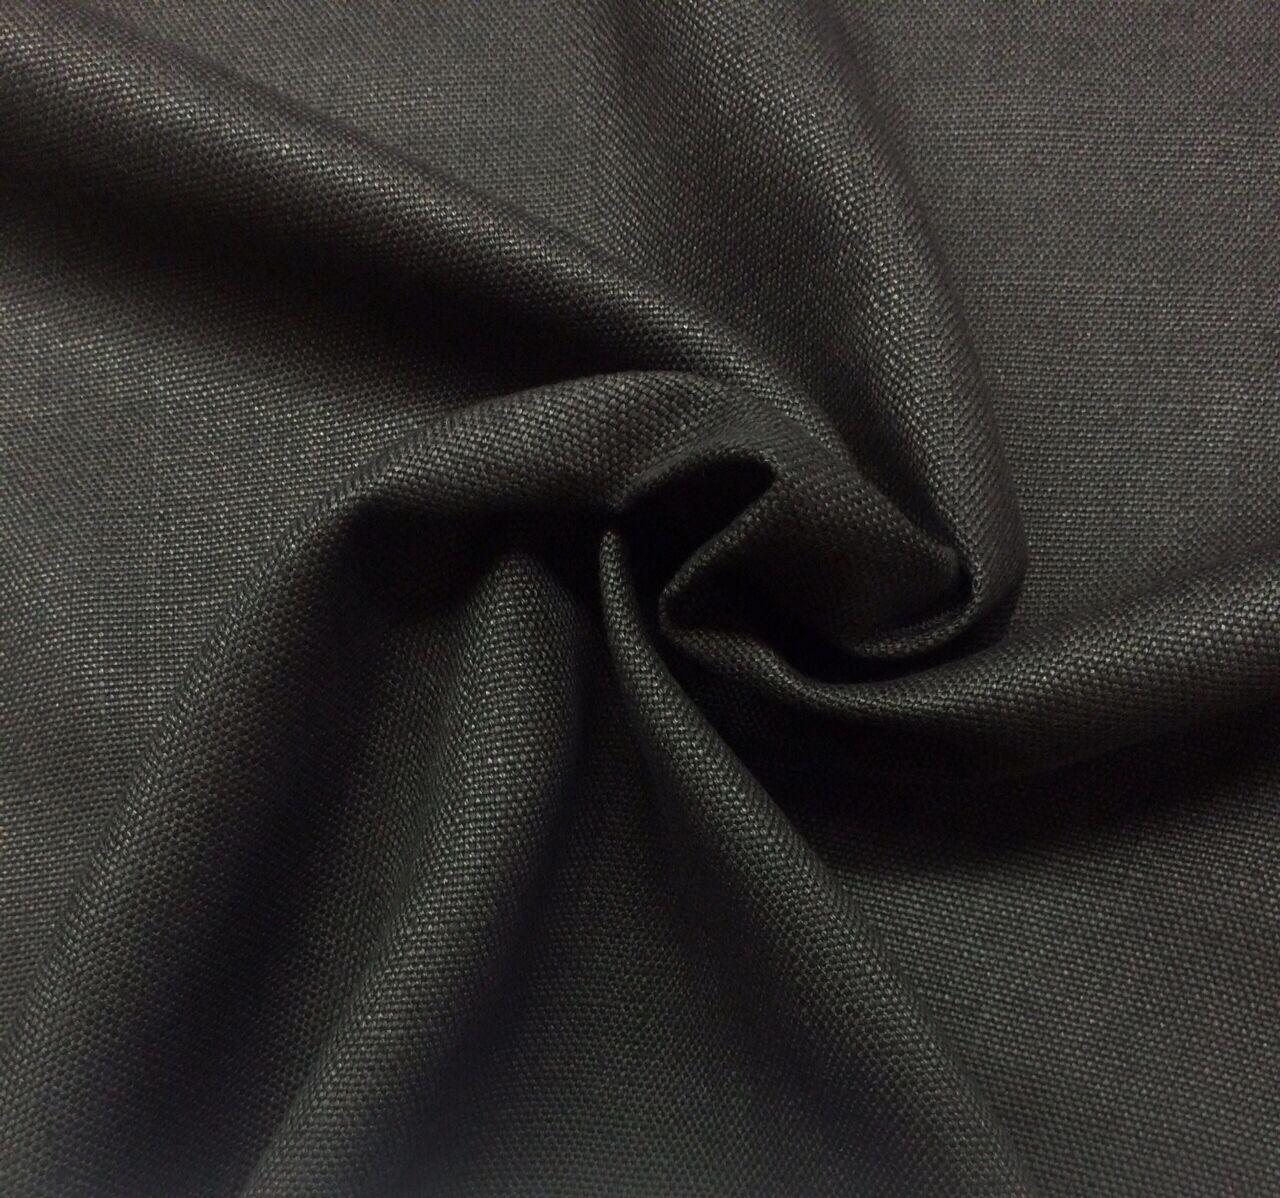 ballard design fabric by the yard best yard design ideas 2017 ballard designs fabric may june 2016 paint colors